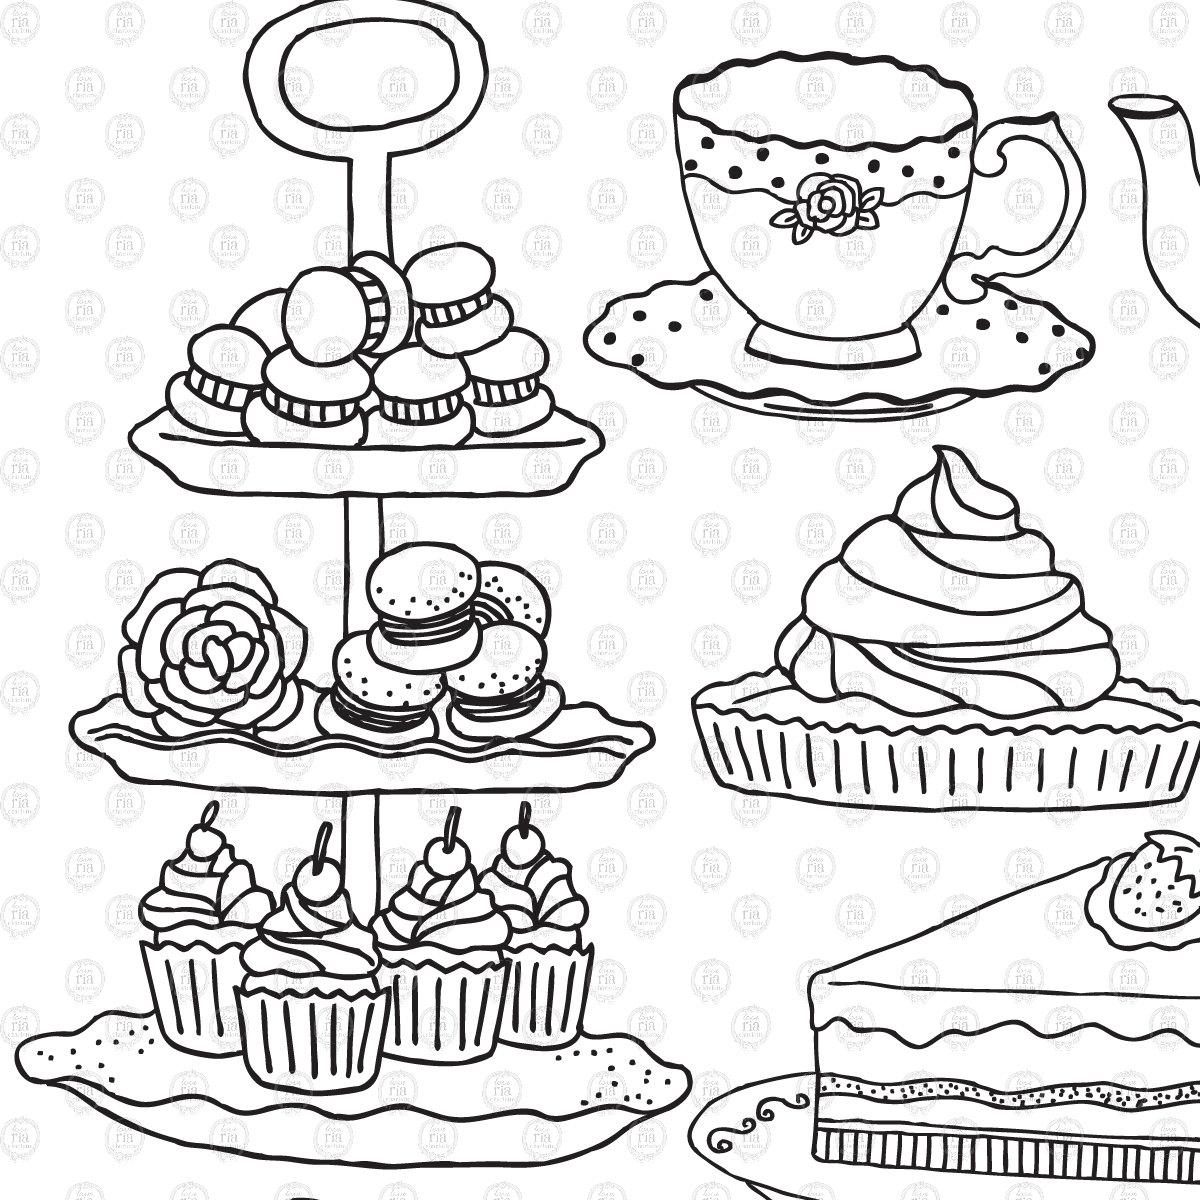 Drawn teacup afternoon tea #12